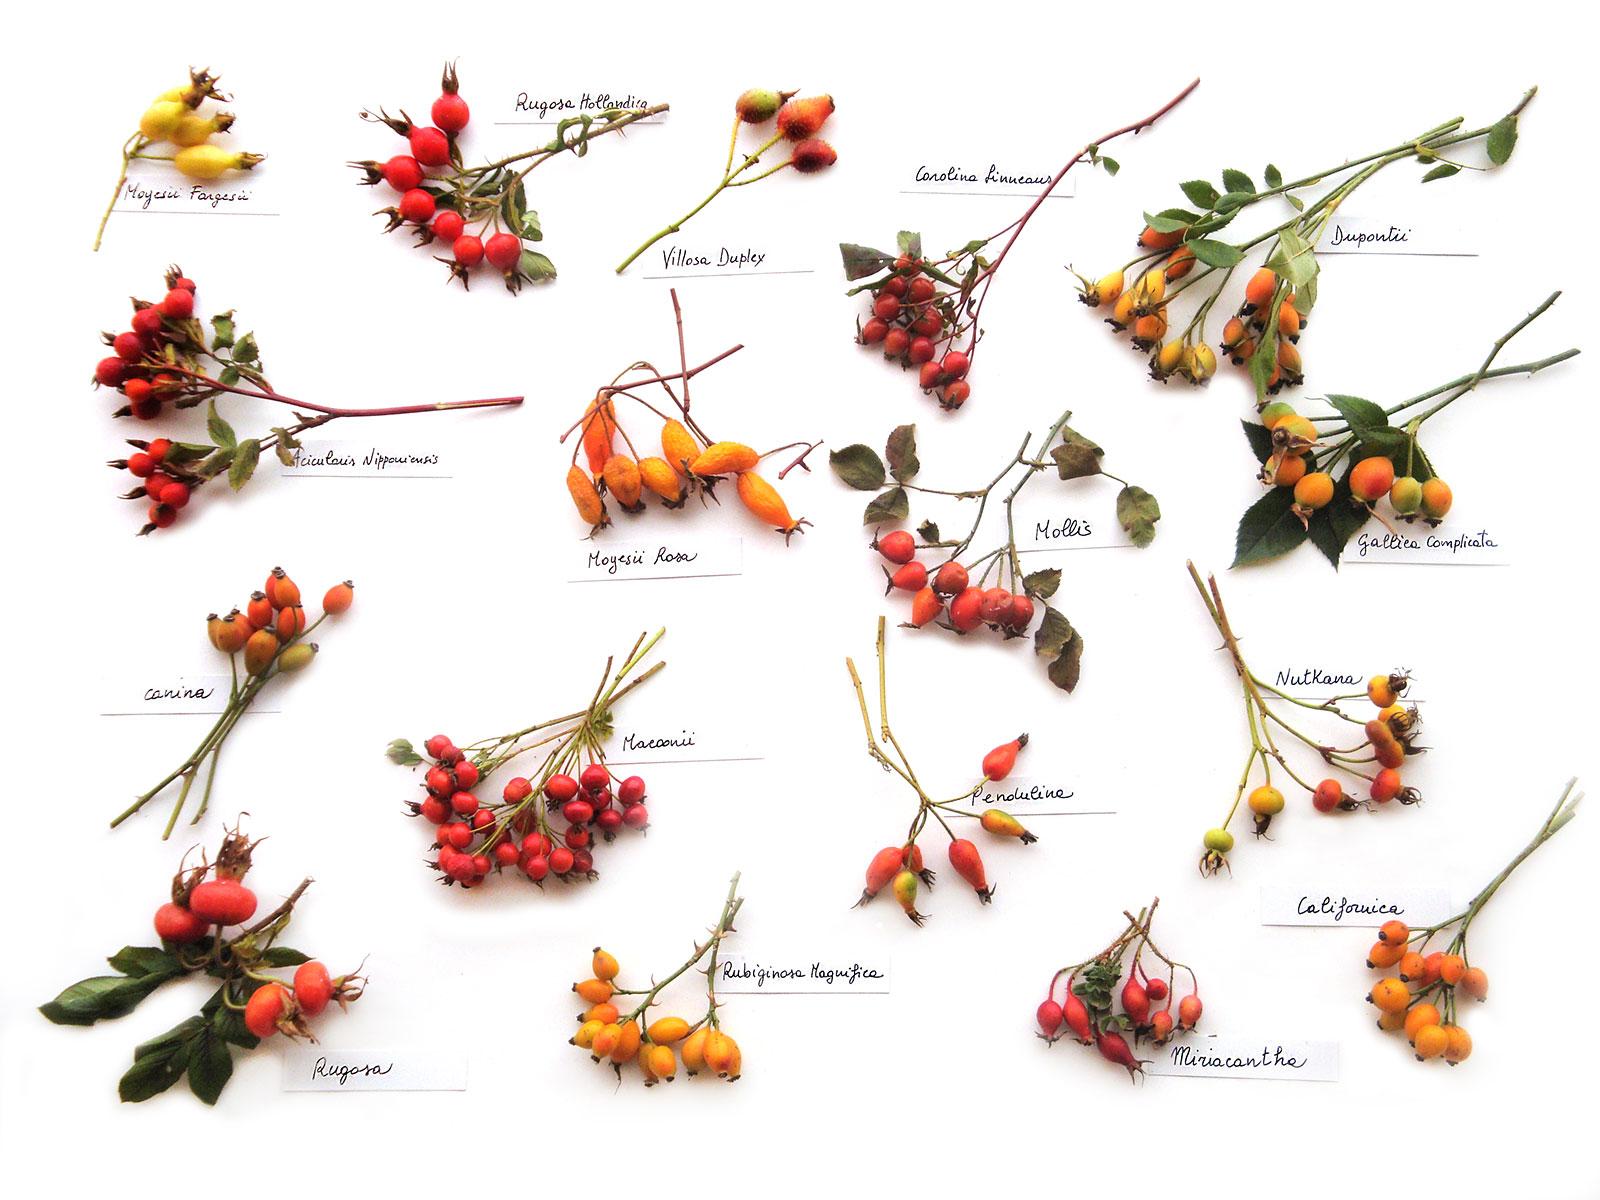 Le bacche delle rose Botaniche